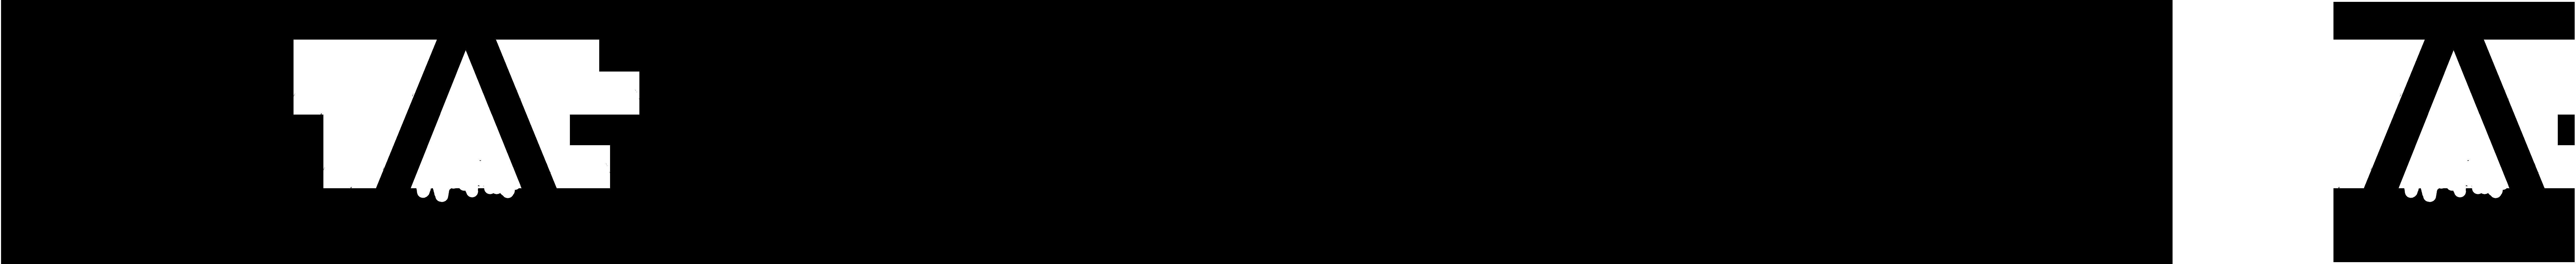 TANGERA logga text 9750x1000 Svart